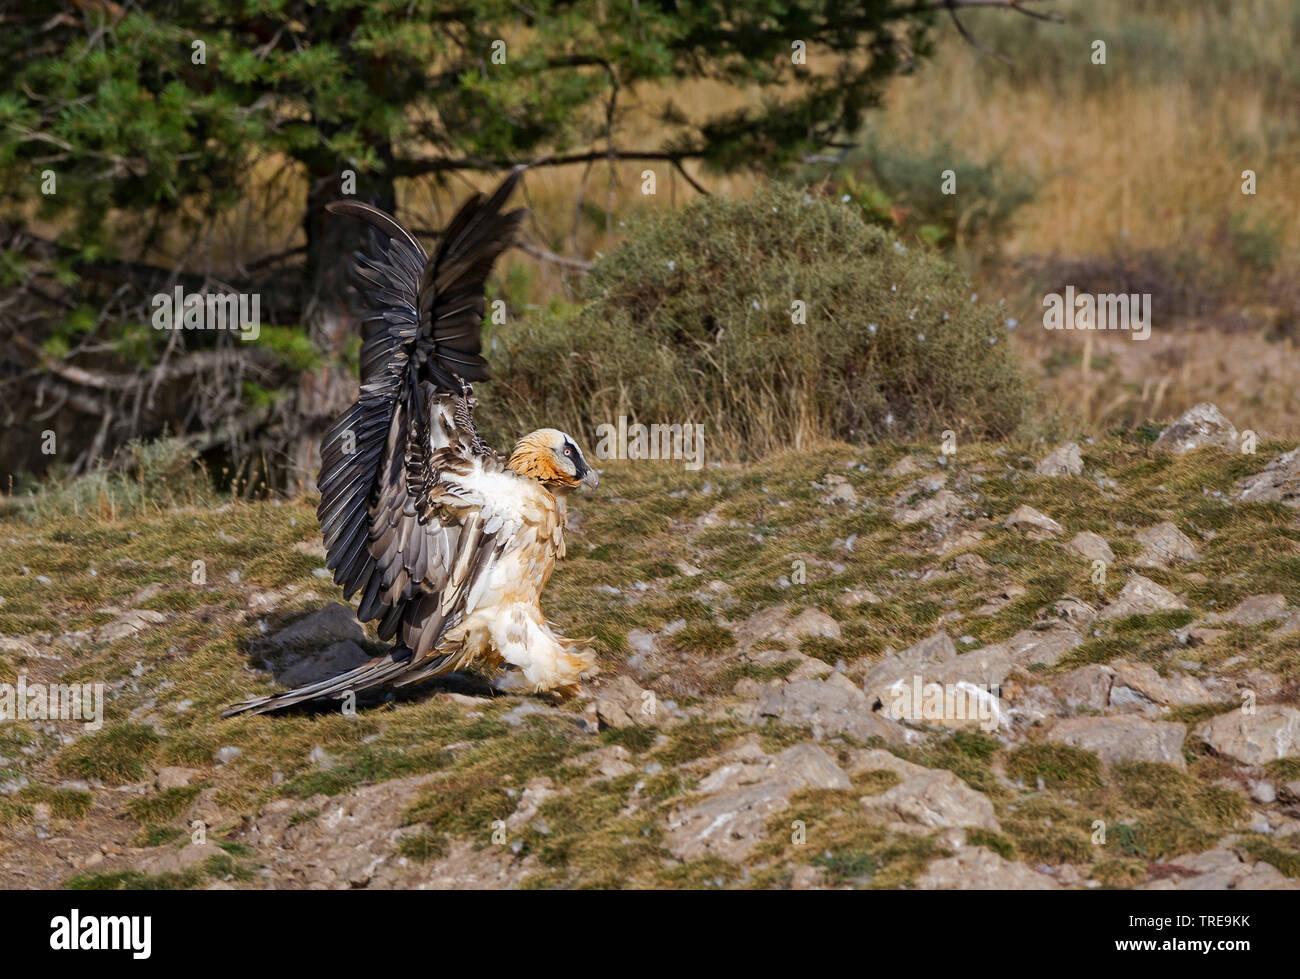 Bartgeier, Bart-Geier, Laemmergeier, Laemmer-Geier (Gypaetus barbatus), Jungvogel, Italien | Lammergeier, Bearded Vulture (Gypaetus barbatus), juvenil - Stock Image